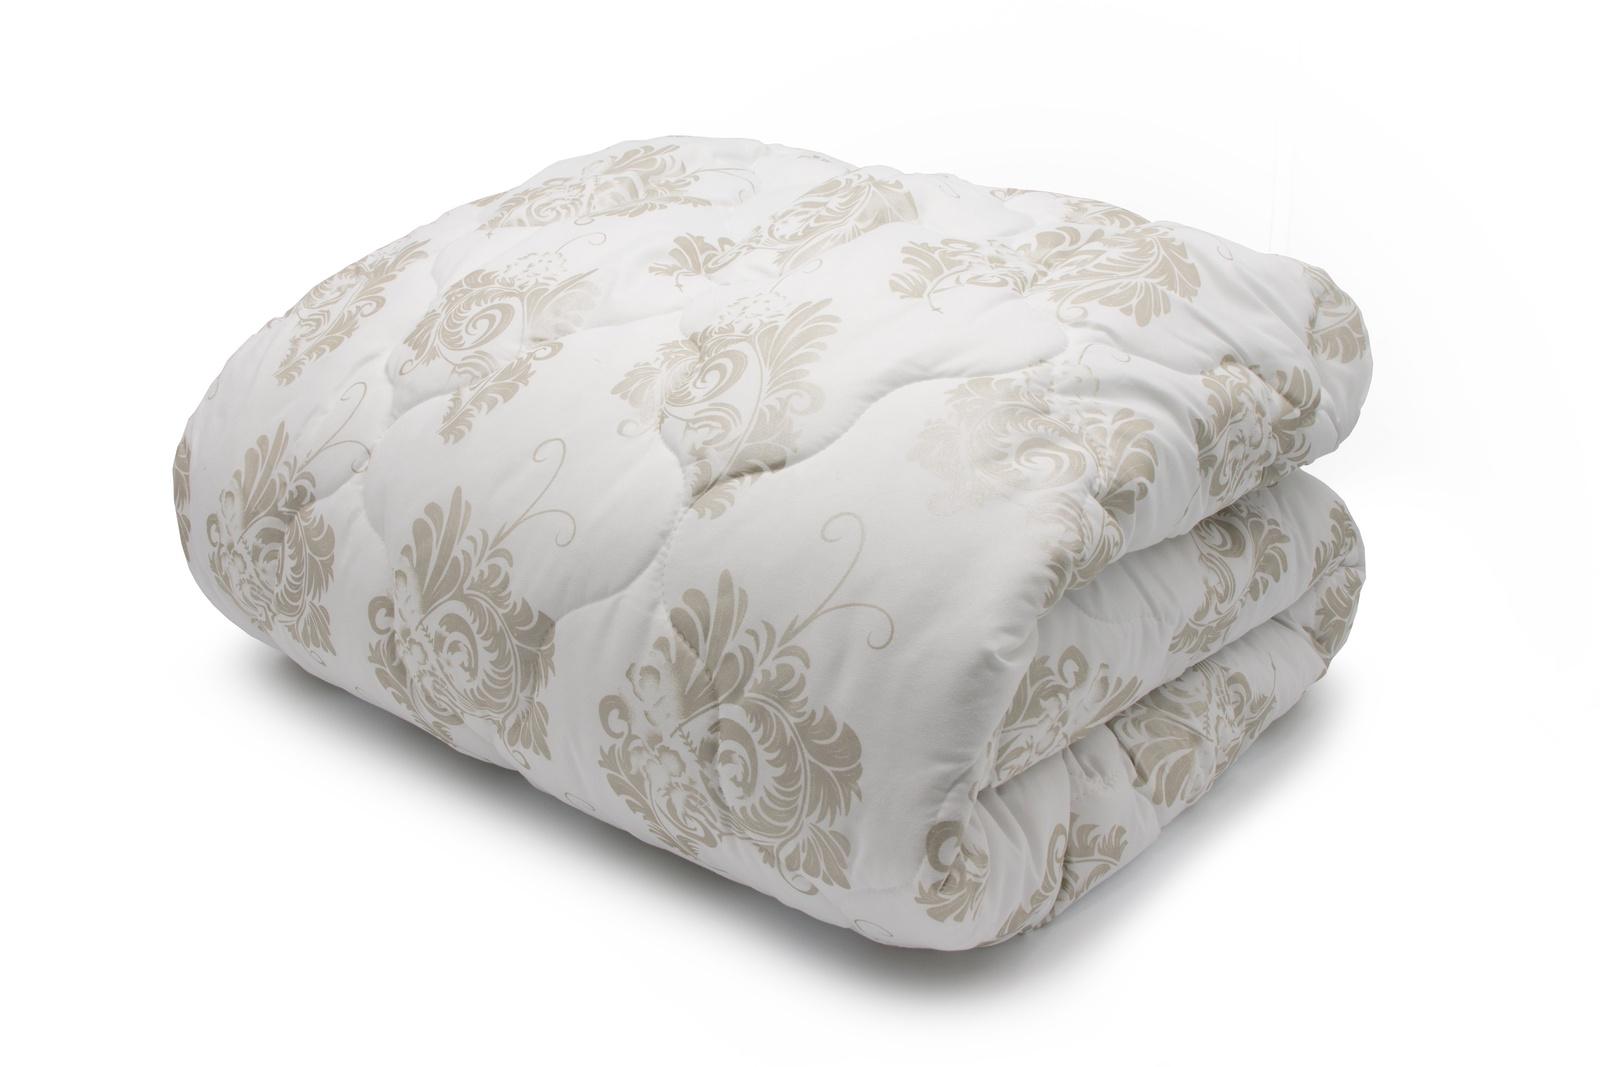 Одеяло RICH LINE Home Decor Эвкалиптовая мечта, бежевый цепь rich line йошкар ола